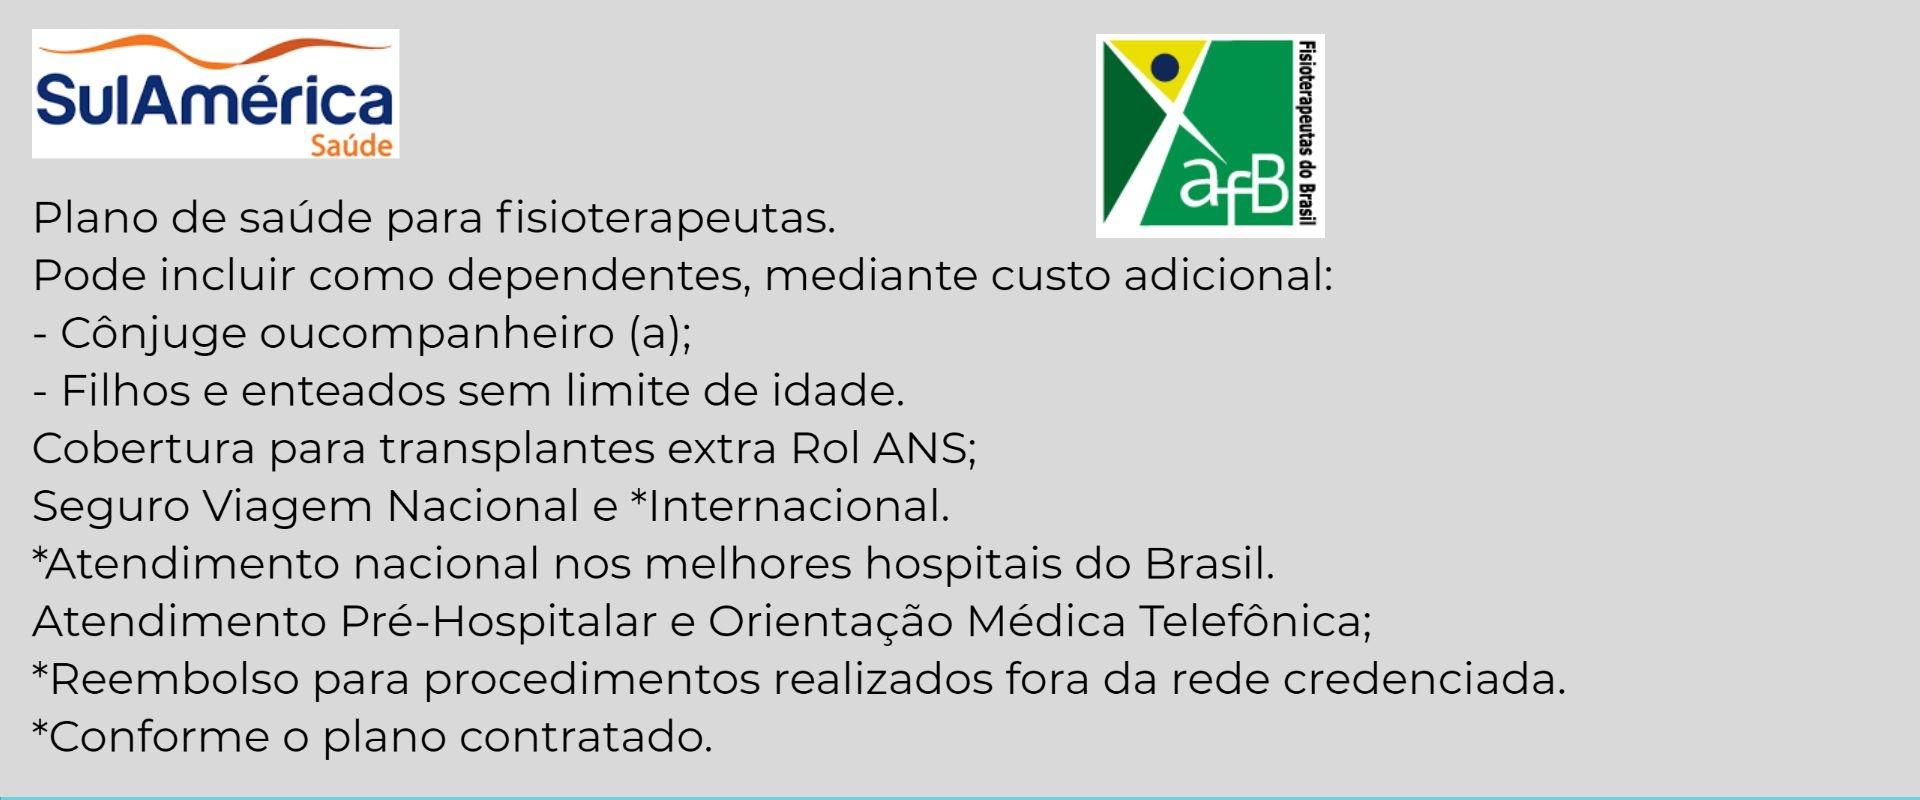 Sul América CREFITO-ES